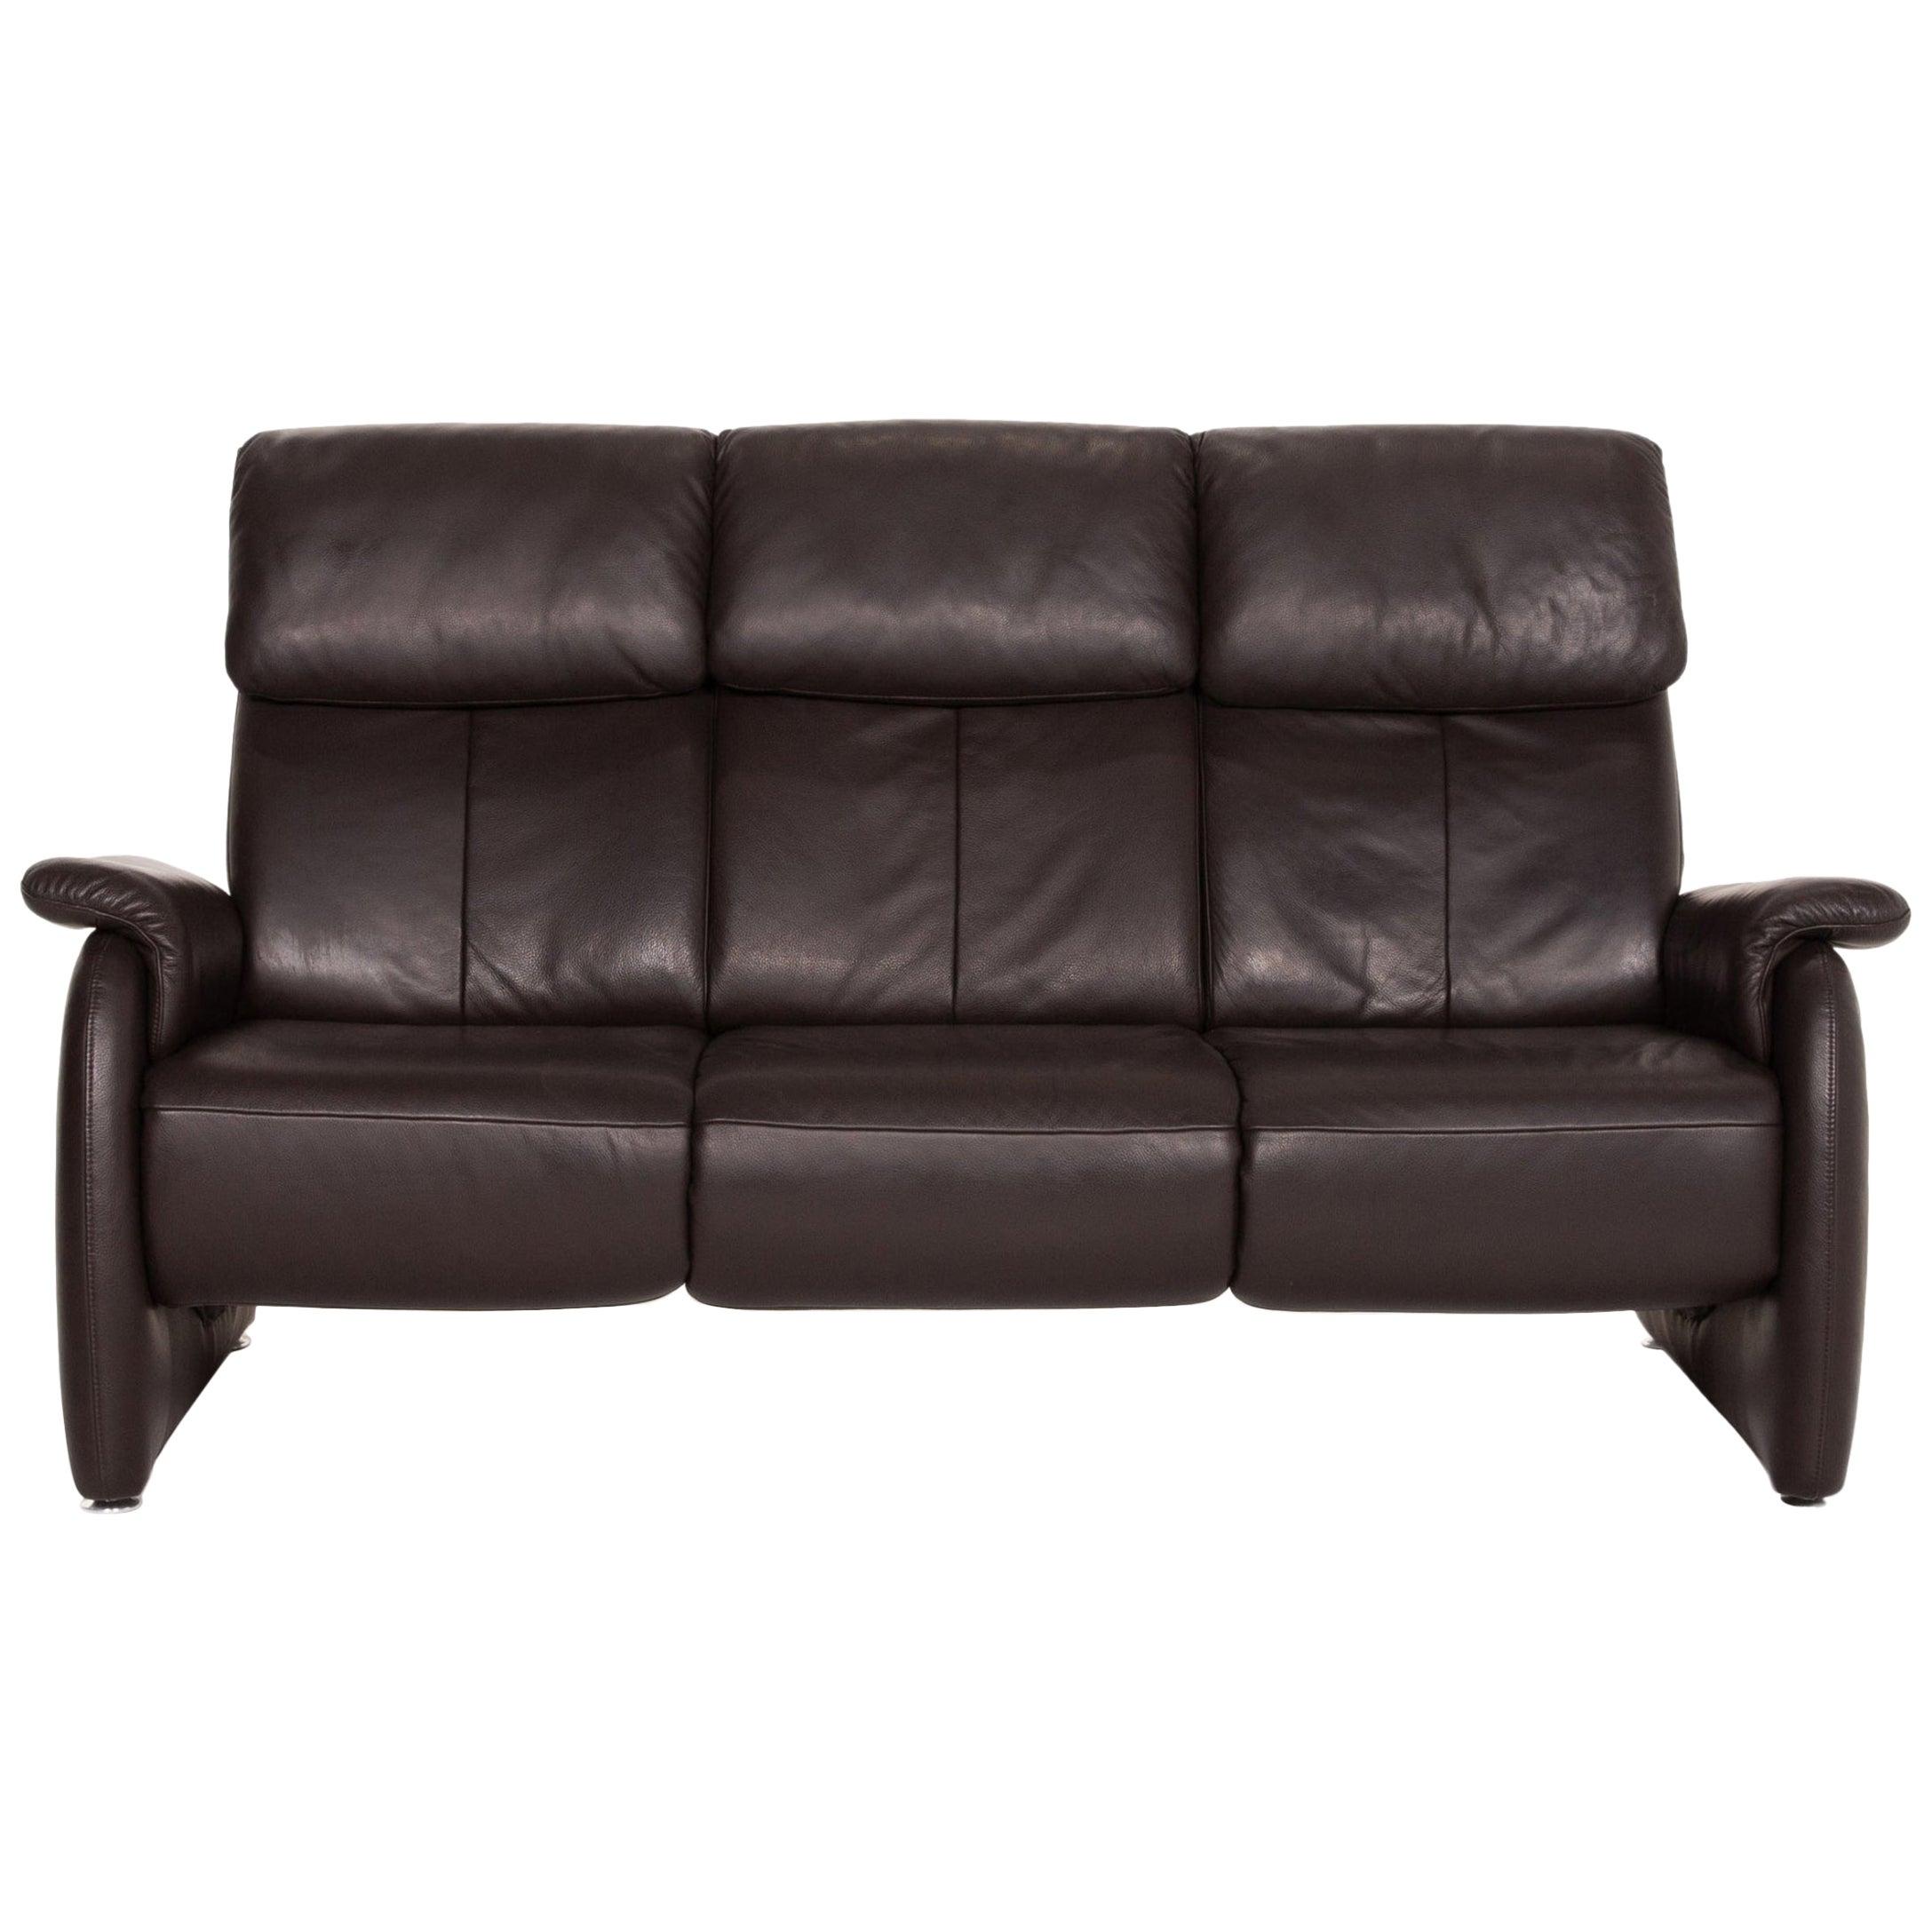 Willi Schillig Leather Sofa Brown Dark Brown Three-Seater Couch